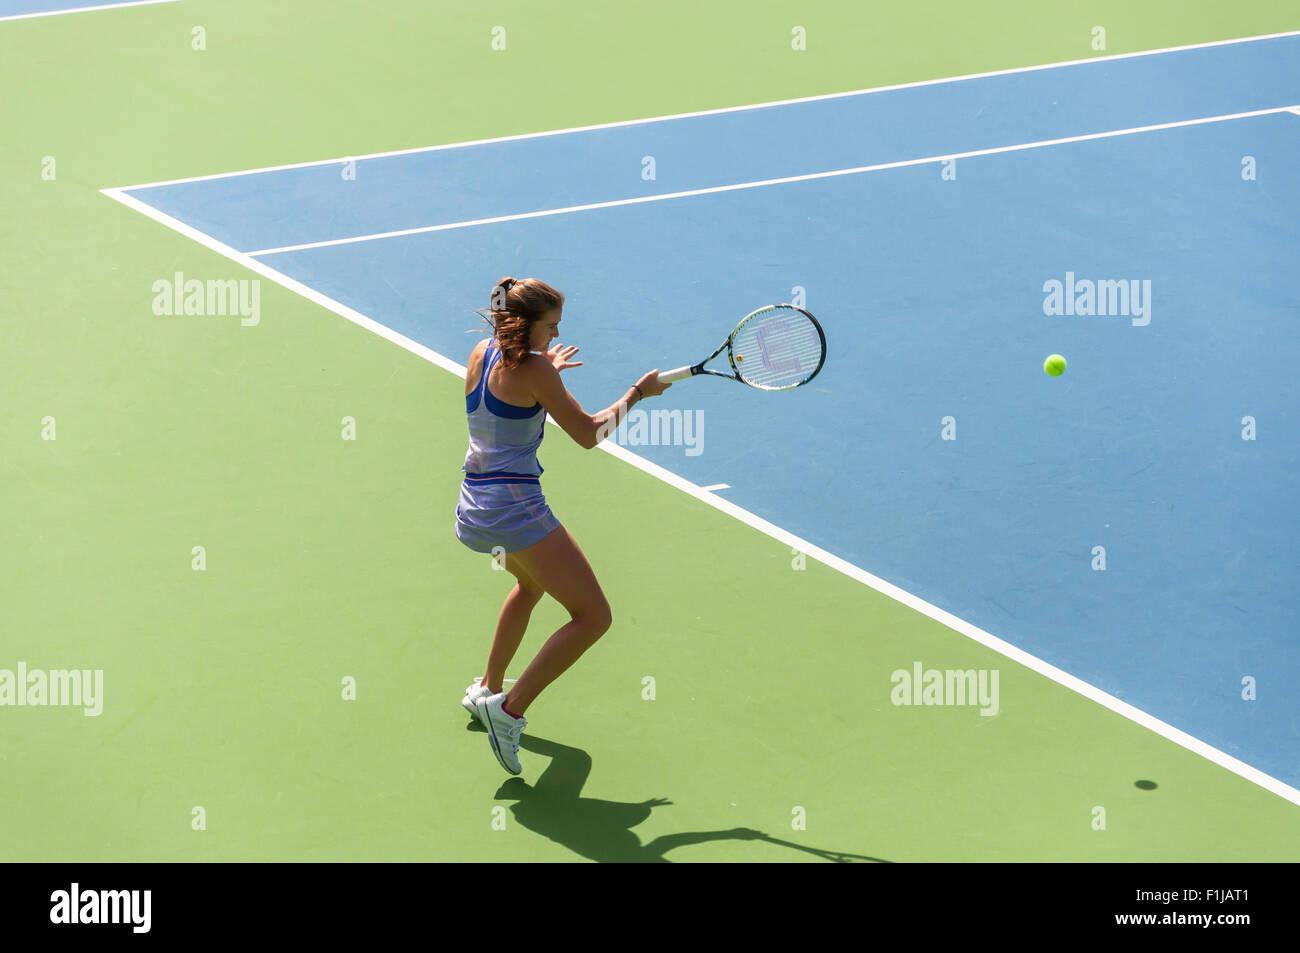 Teenage girl hitting forehand on tennis court, Chiswick, London Borough of Hounslow, Greater London, England, United - Stock Image